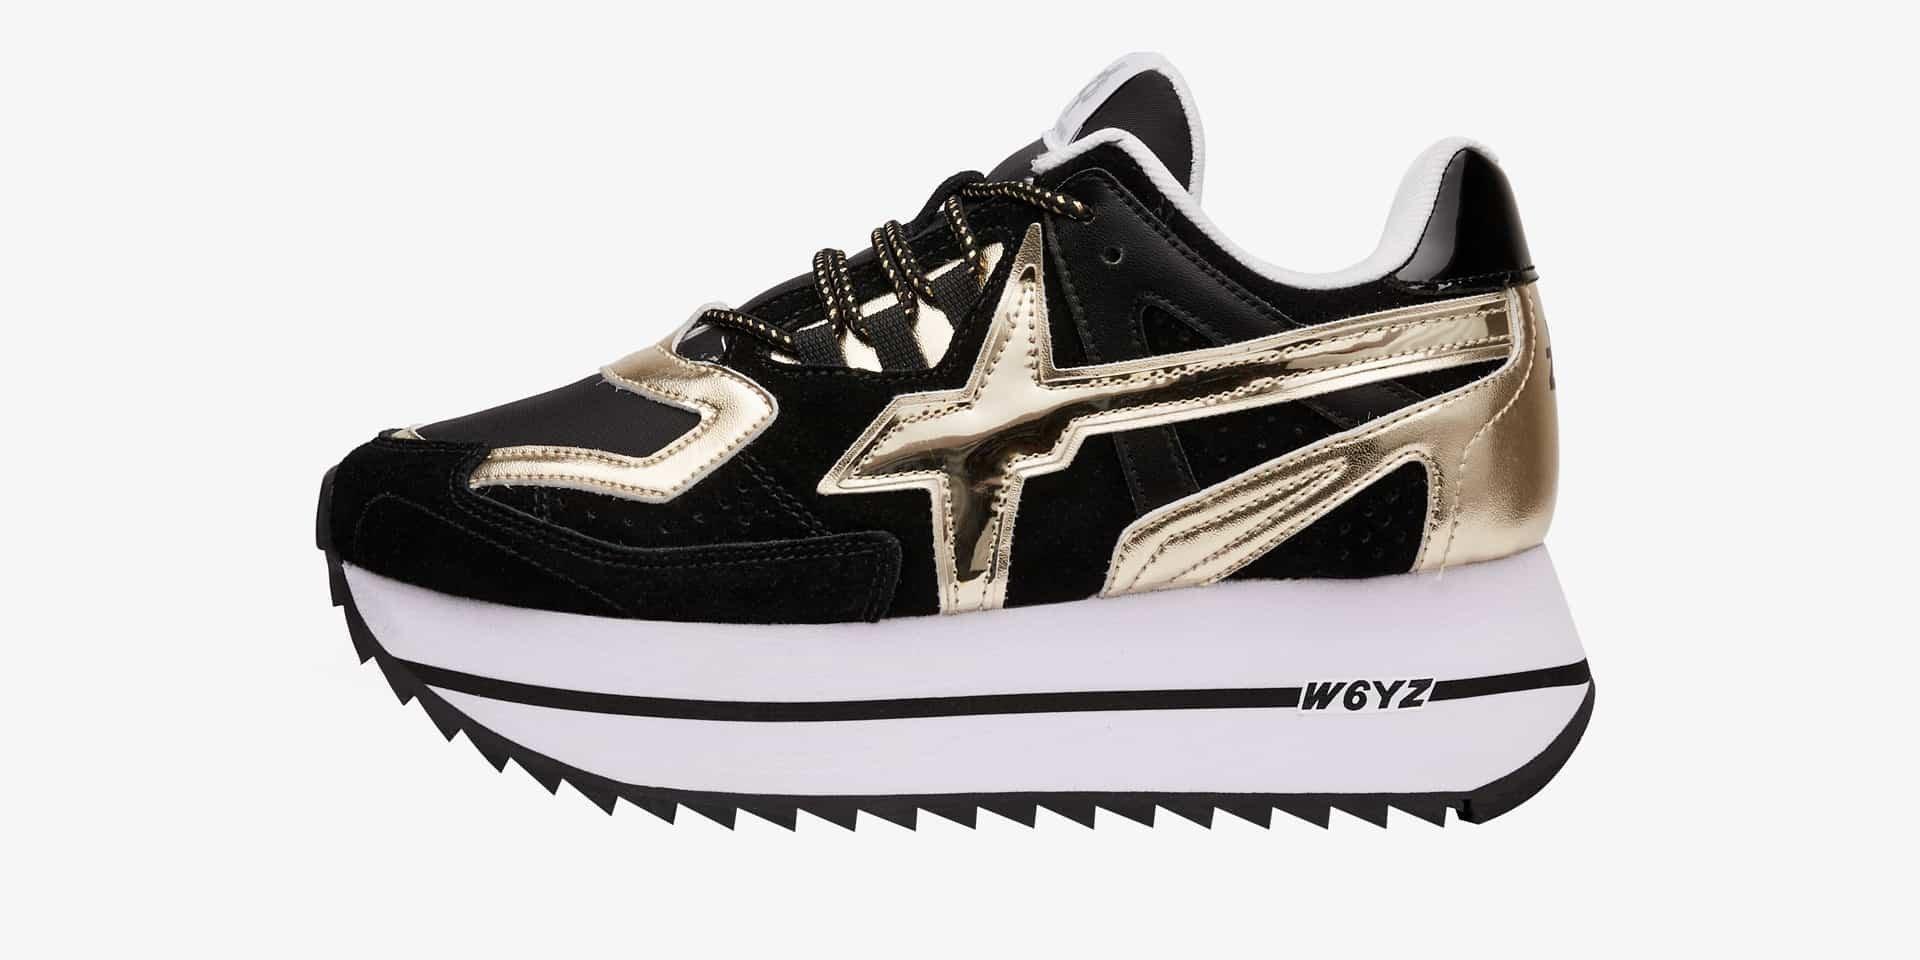 DEB-W. - Leather sneakers - Black